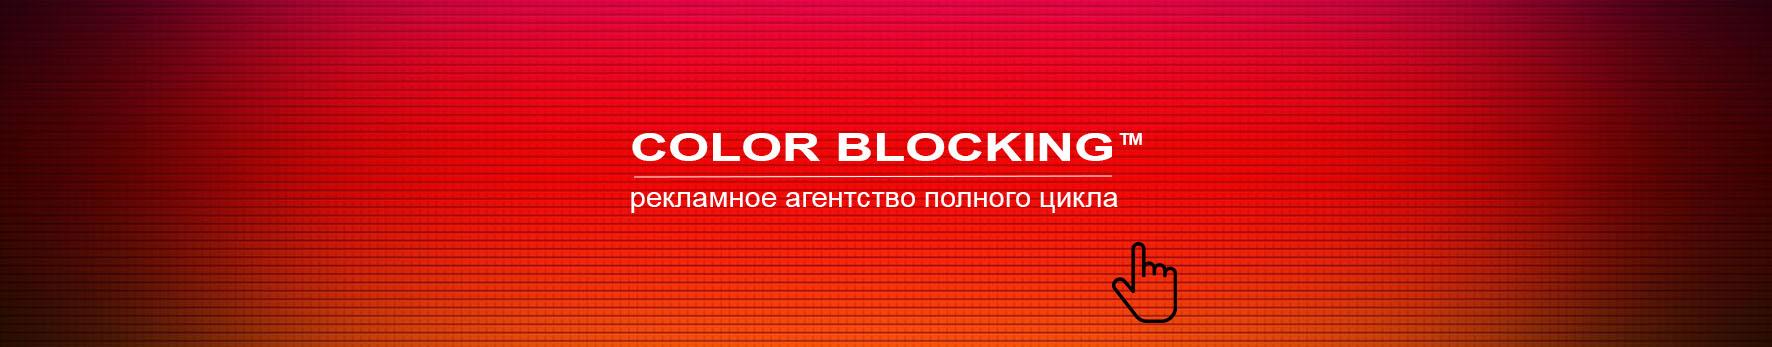 COLOR BLOCKING агентство